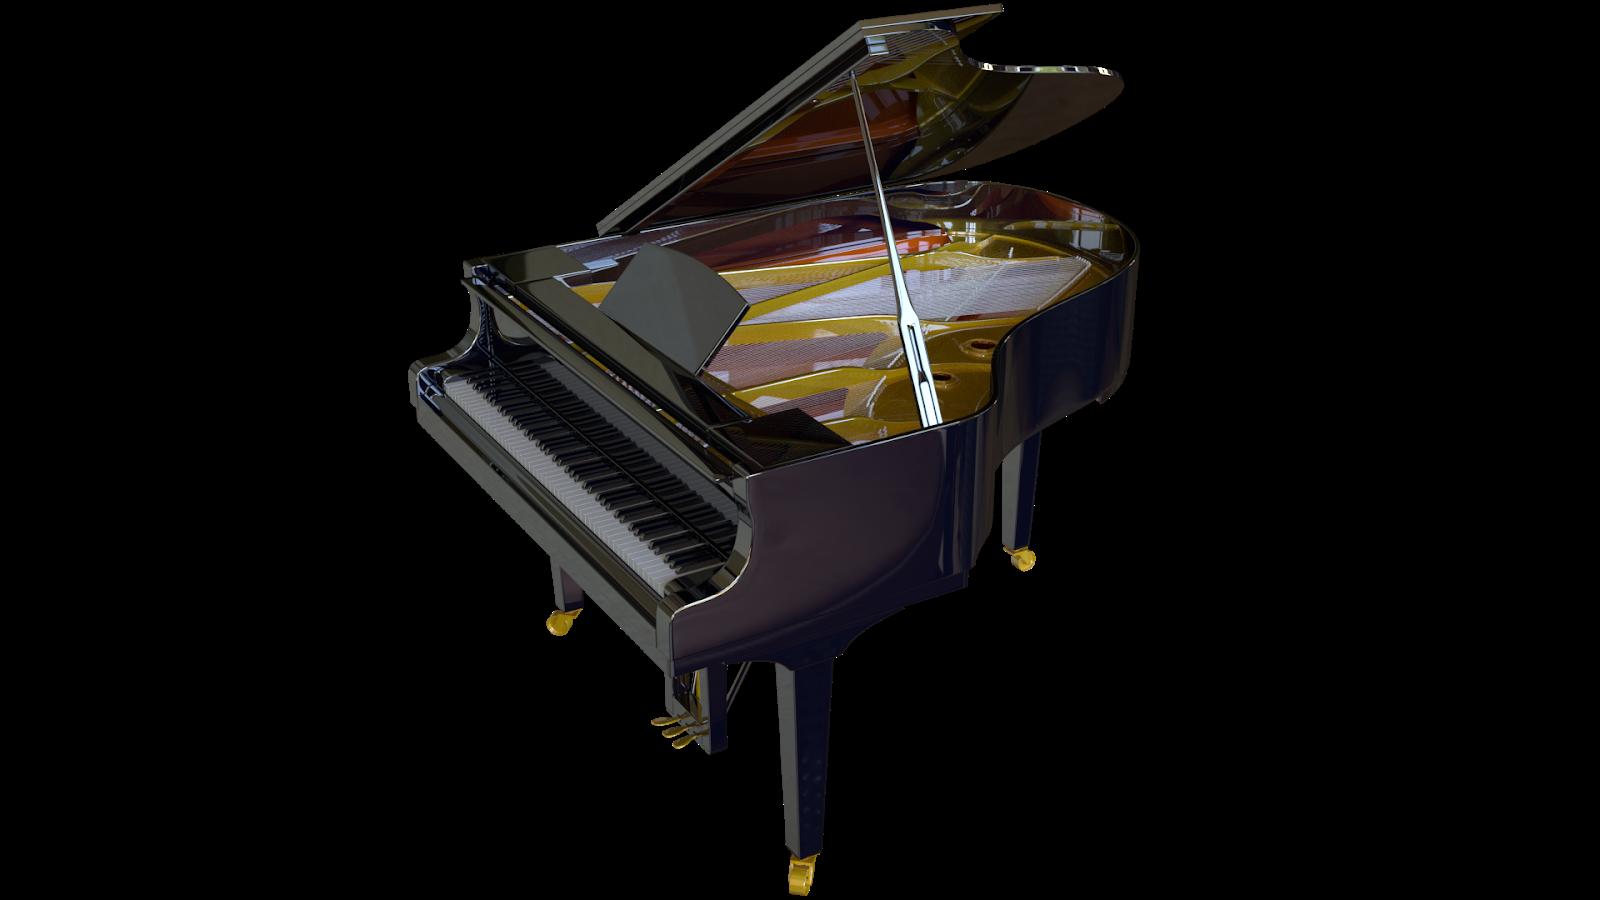 Free 3D Yamaha C3 Grand Piano CC0 3DS - Free 3D Models Under Public Domain